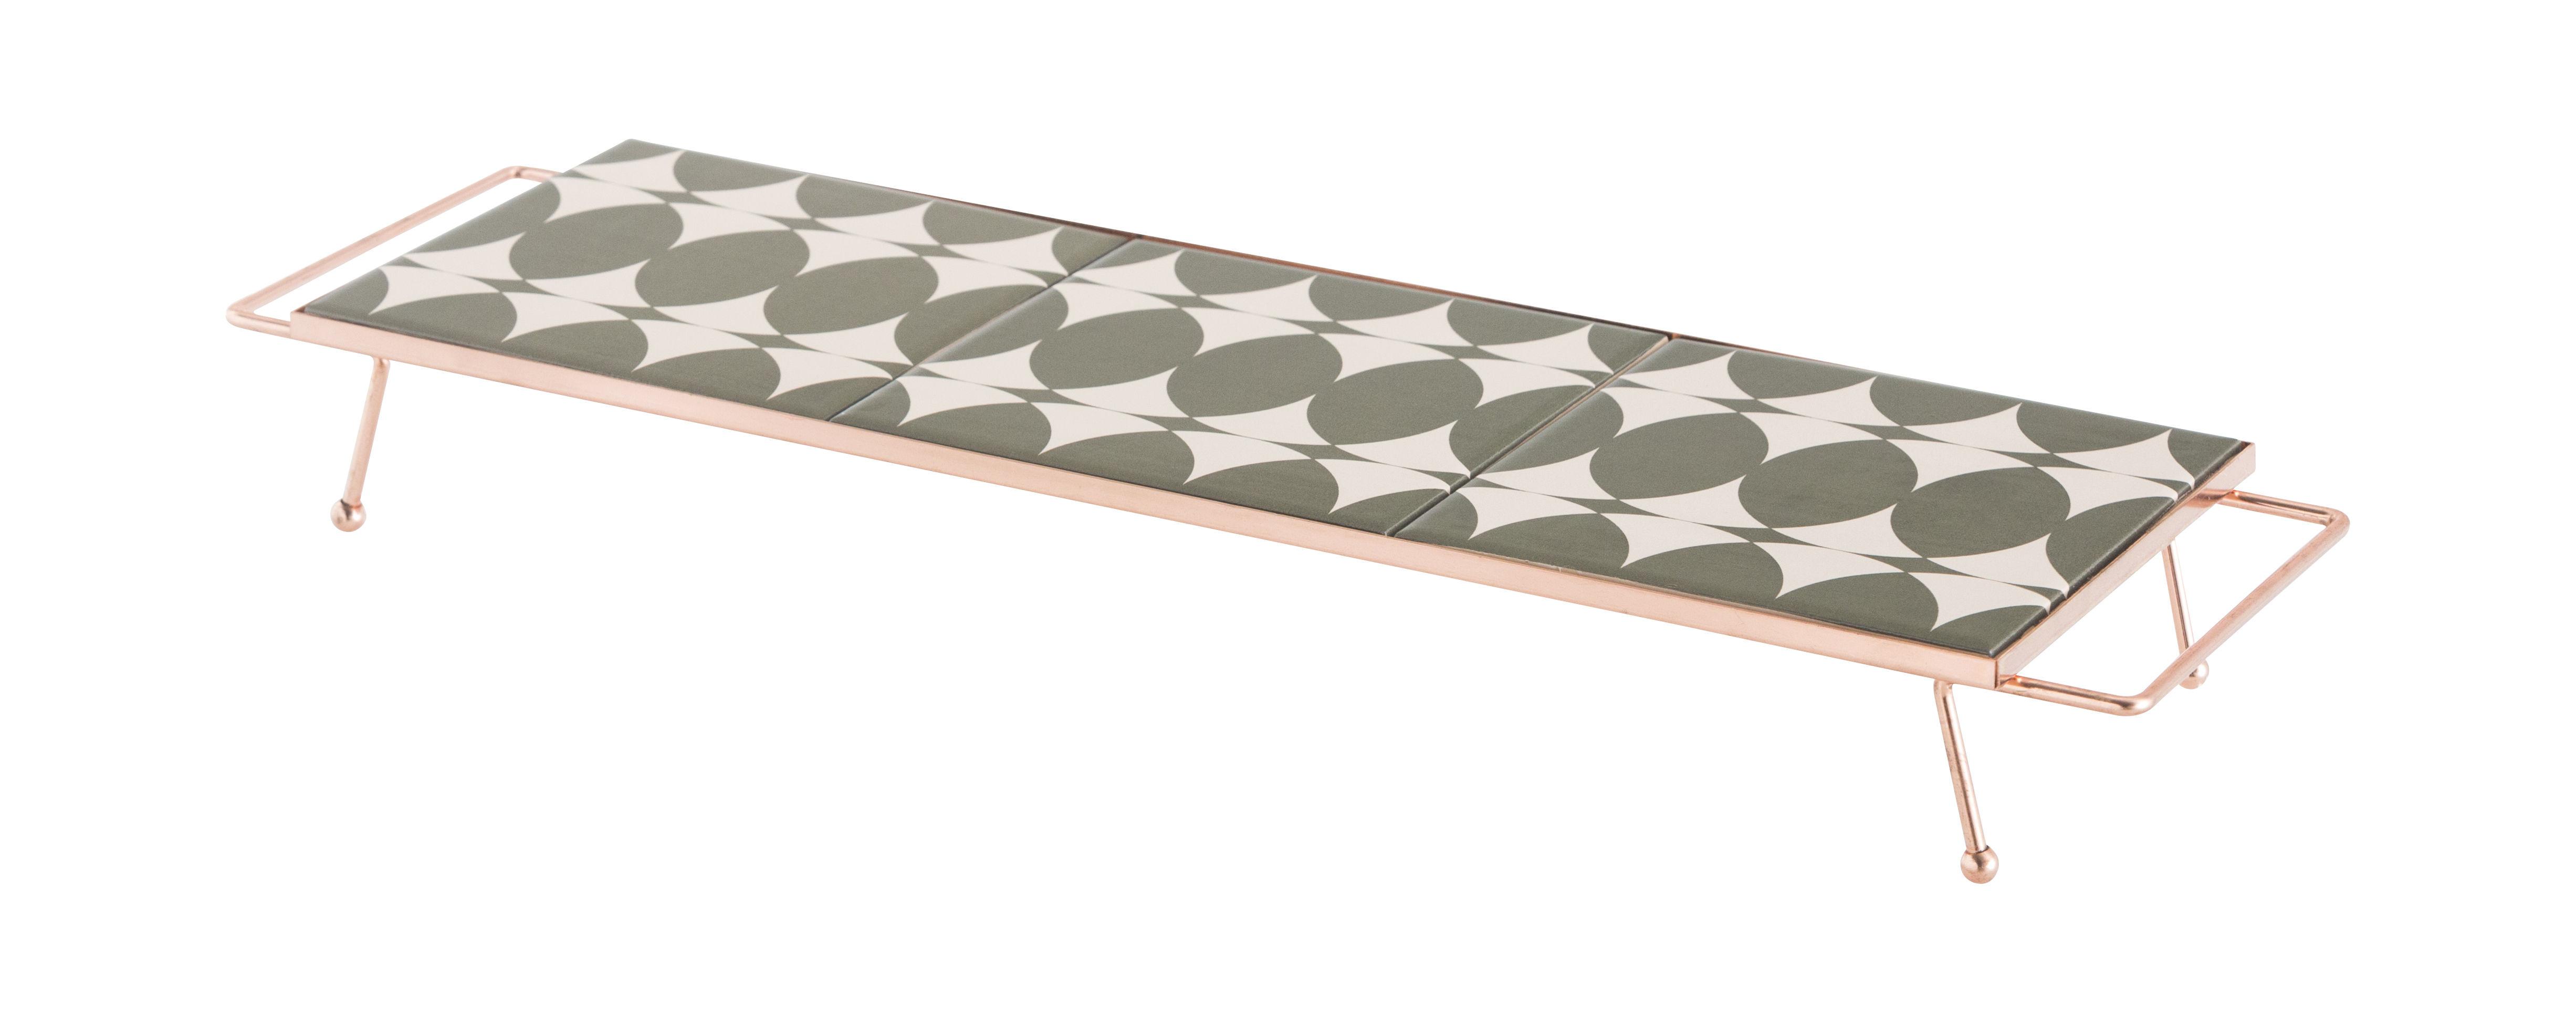 Tableware - Trays - Mix&Match Tray - 45 x 15 cm / Ceramic & copper by Gan - Green & white - Ceramic, Copper plated aluminium